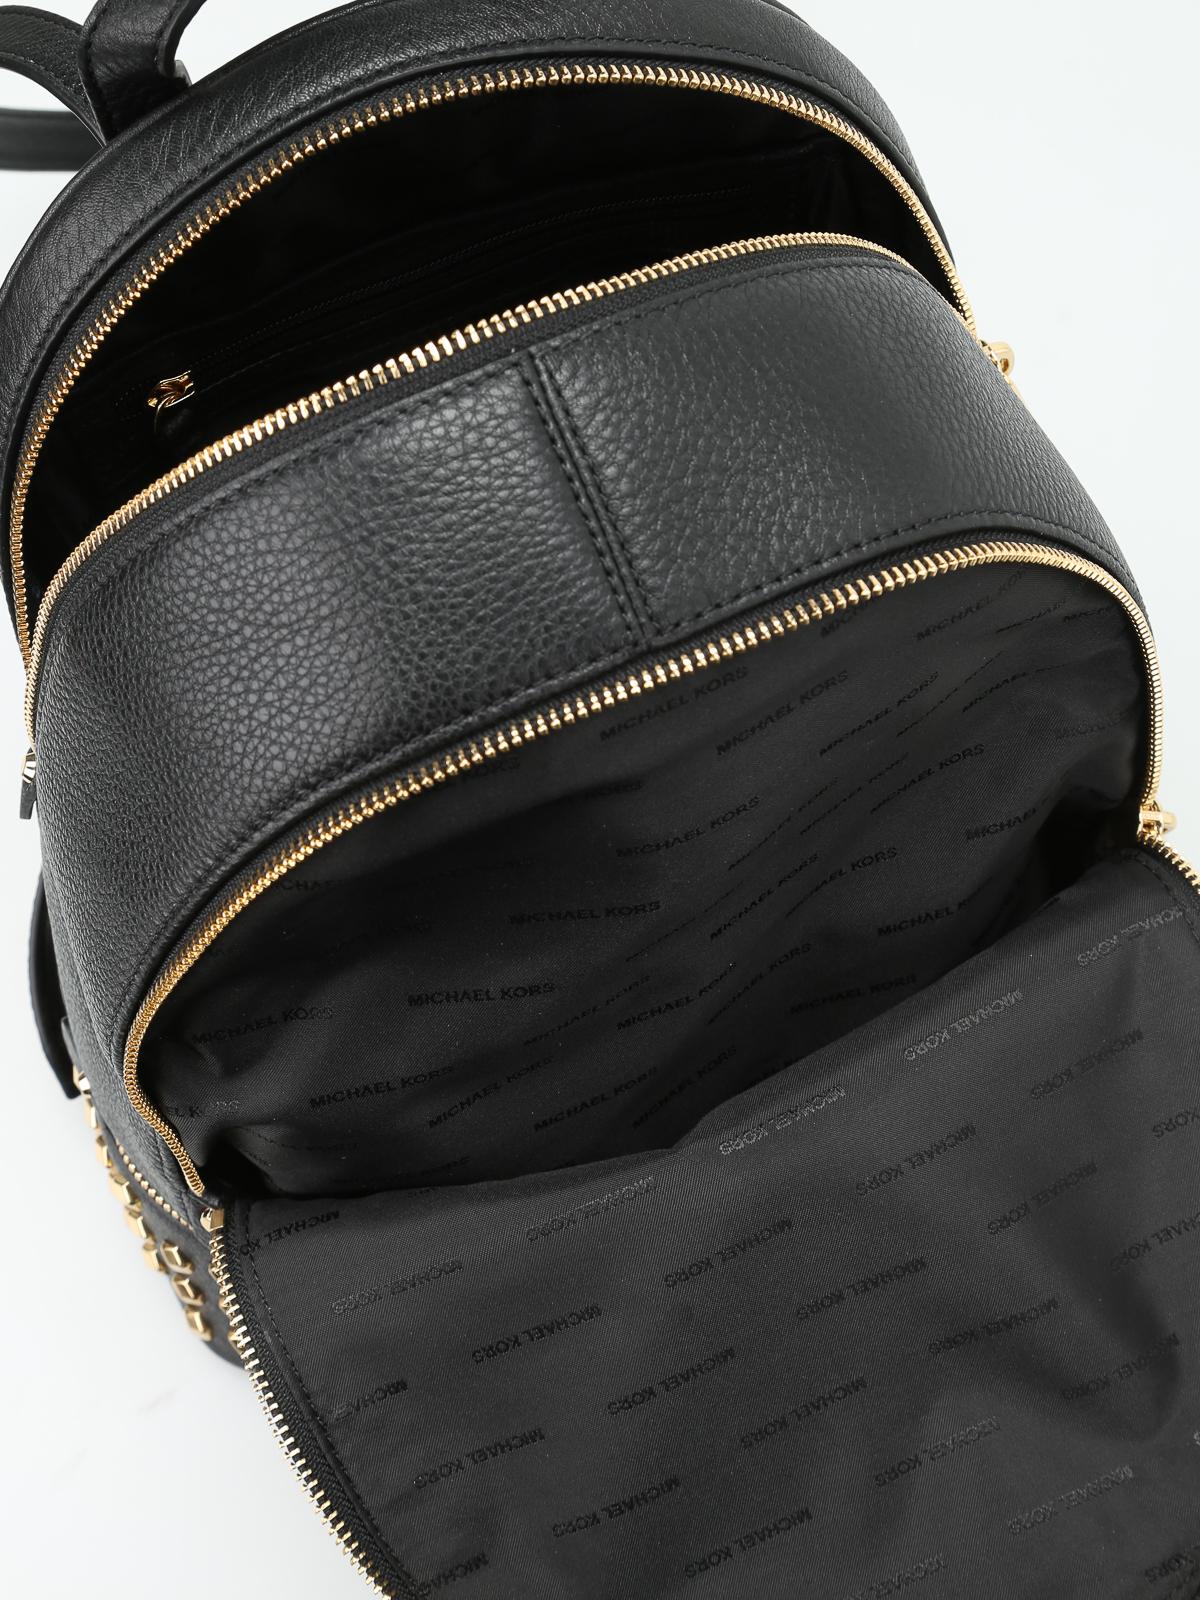 e4652615afc11f Michael Kors - Rhea studded backpack - backpacks - 30S7GEZB2L 001